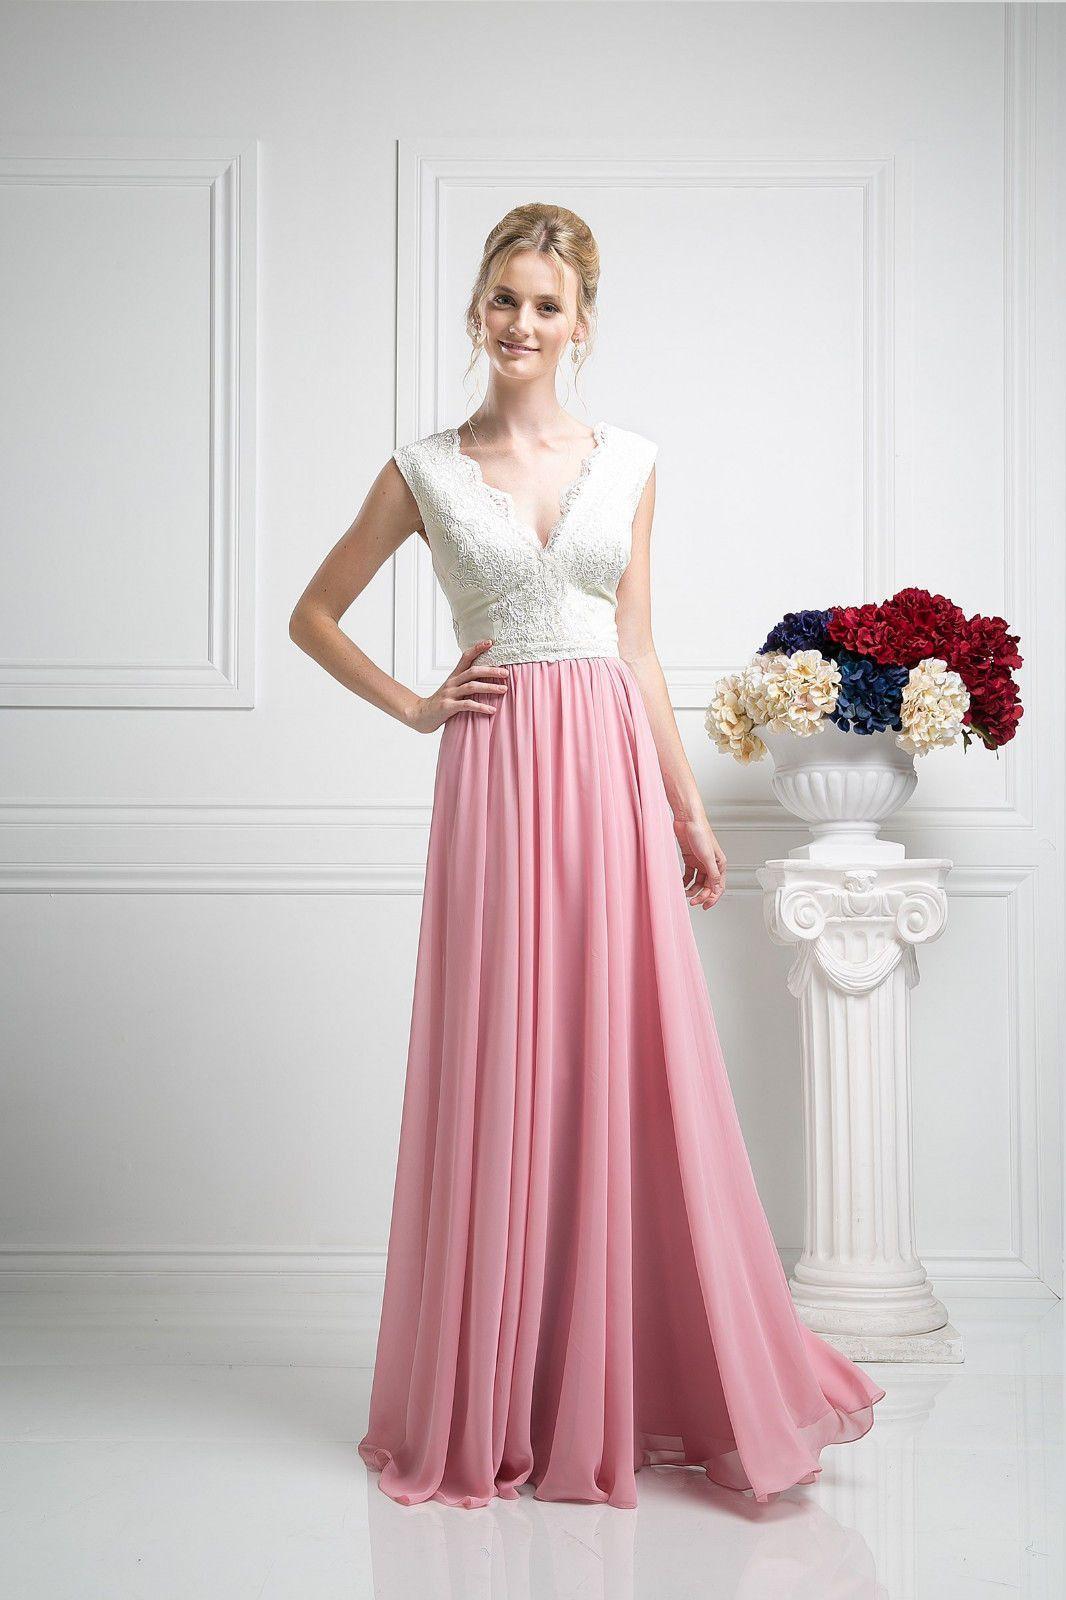 Summer Long Bridesmaids Dress Formal Cocktail Gown